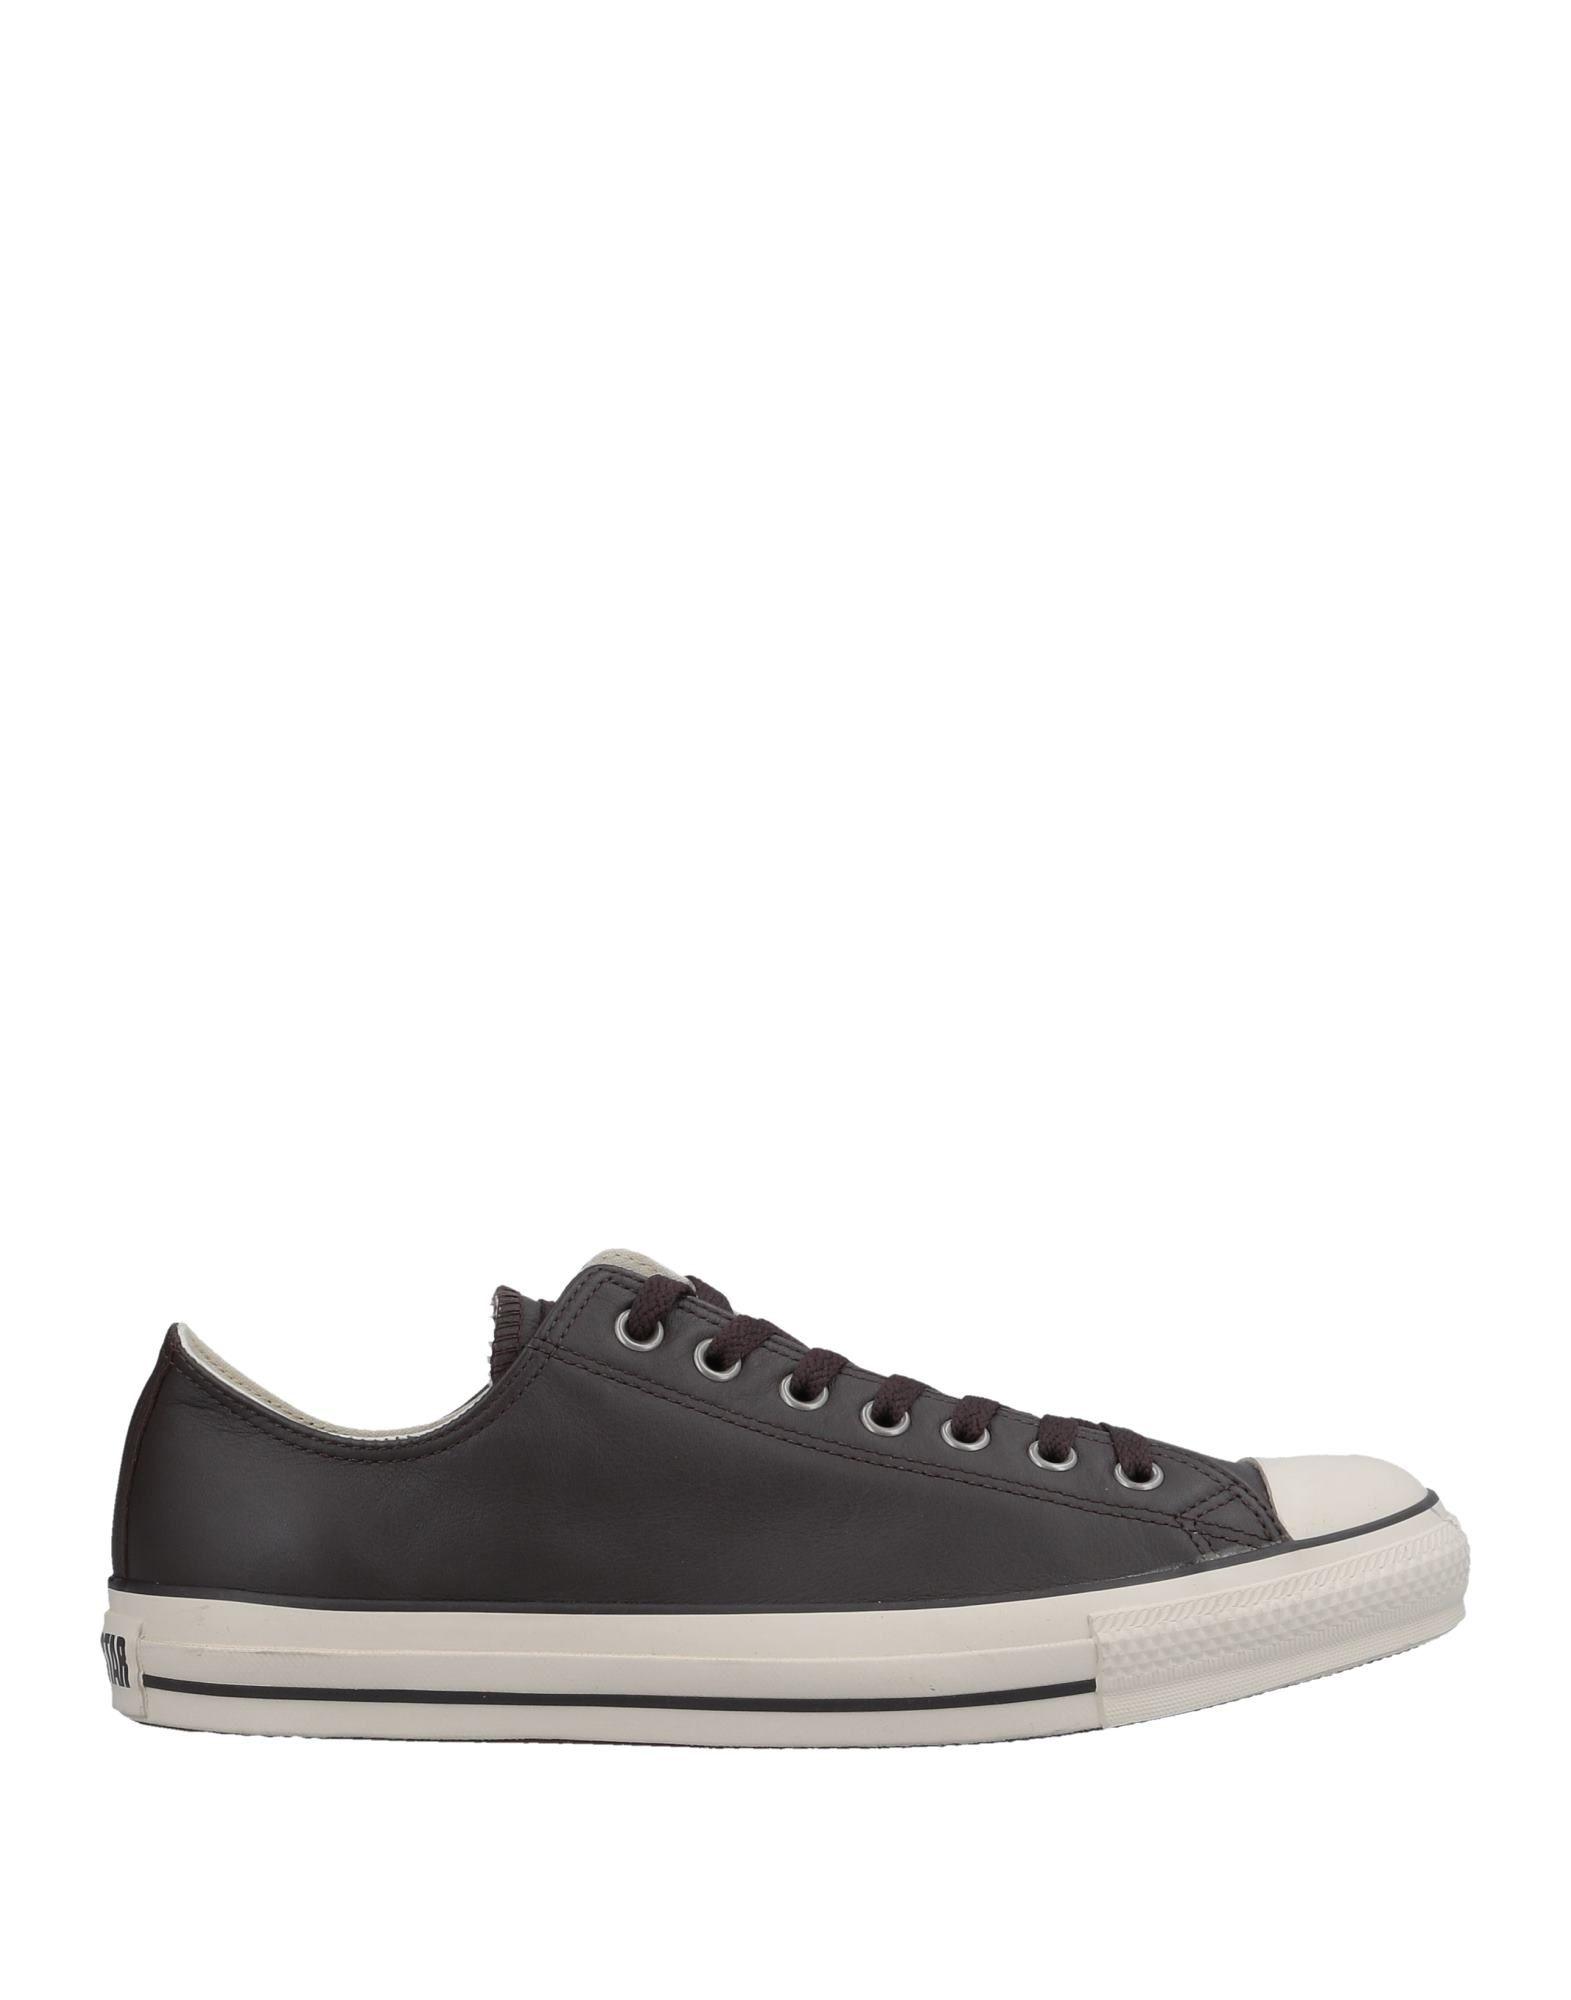 Rabatt echte Schuhe Converse All Star Sneakers Herren  11509962KI